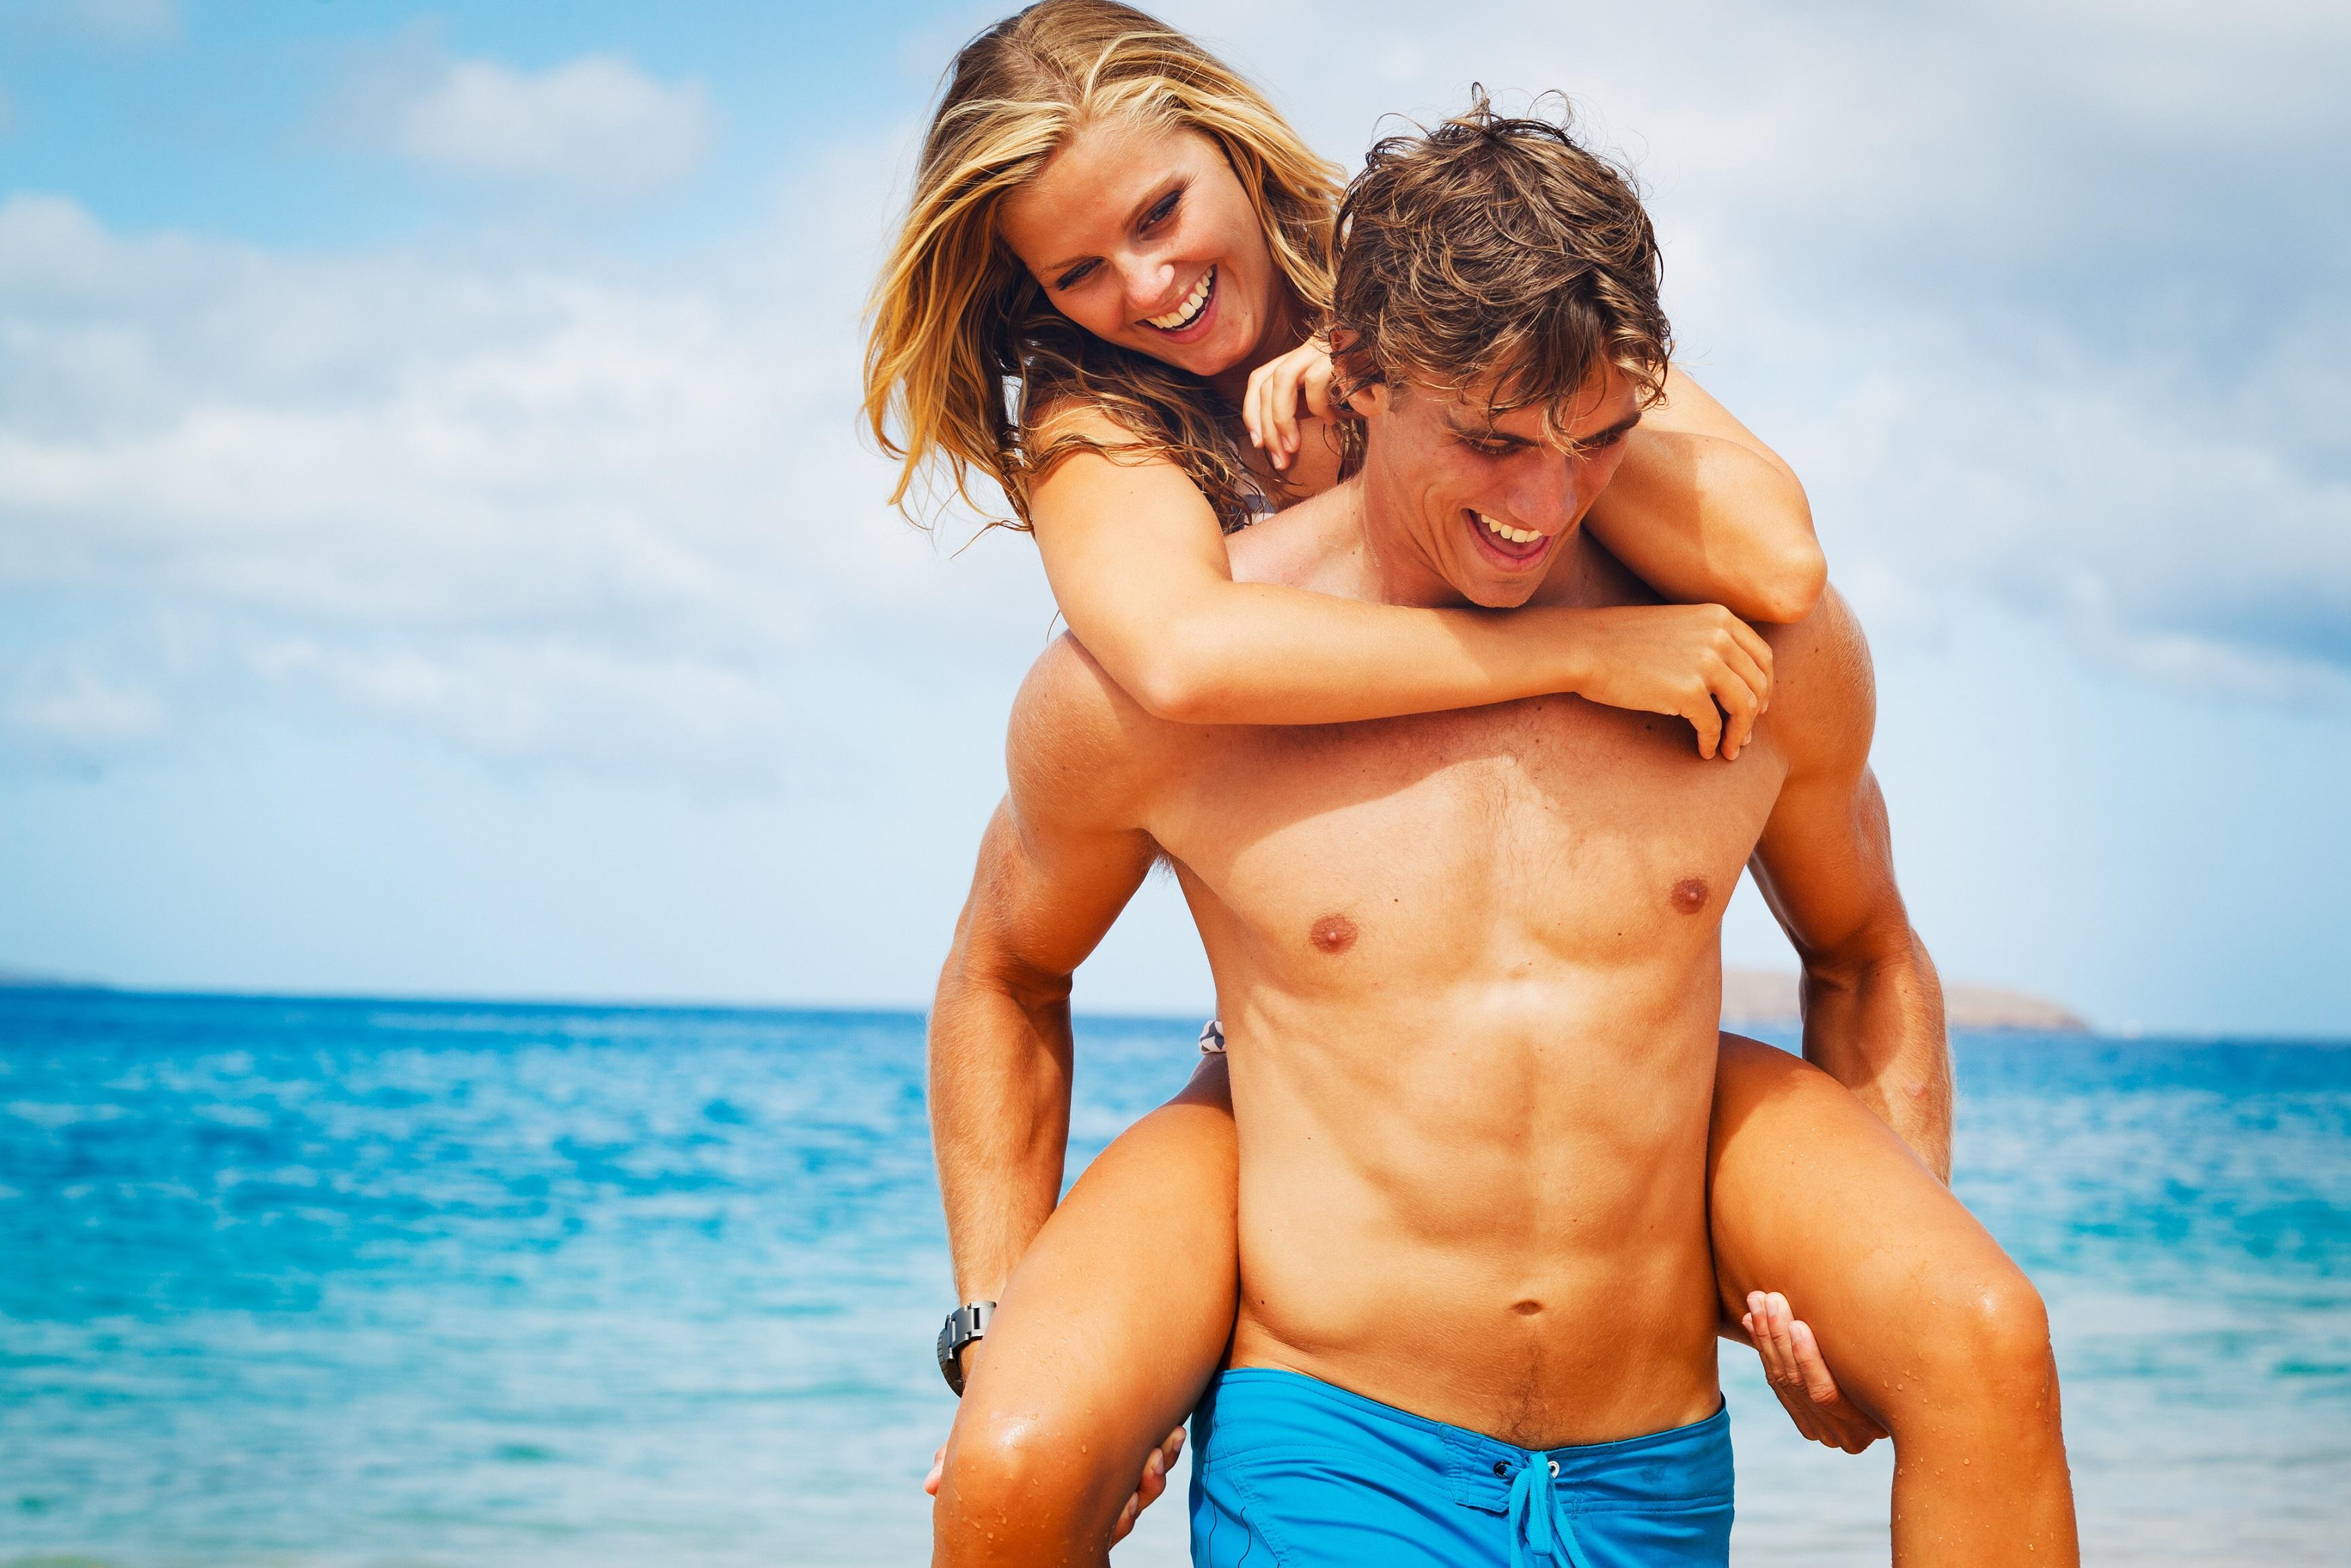 Mann trägt Frau auf dem Rücken am Strand